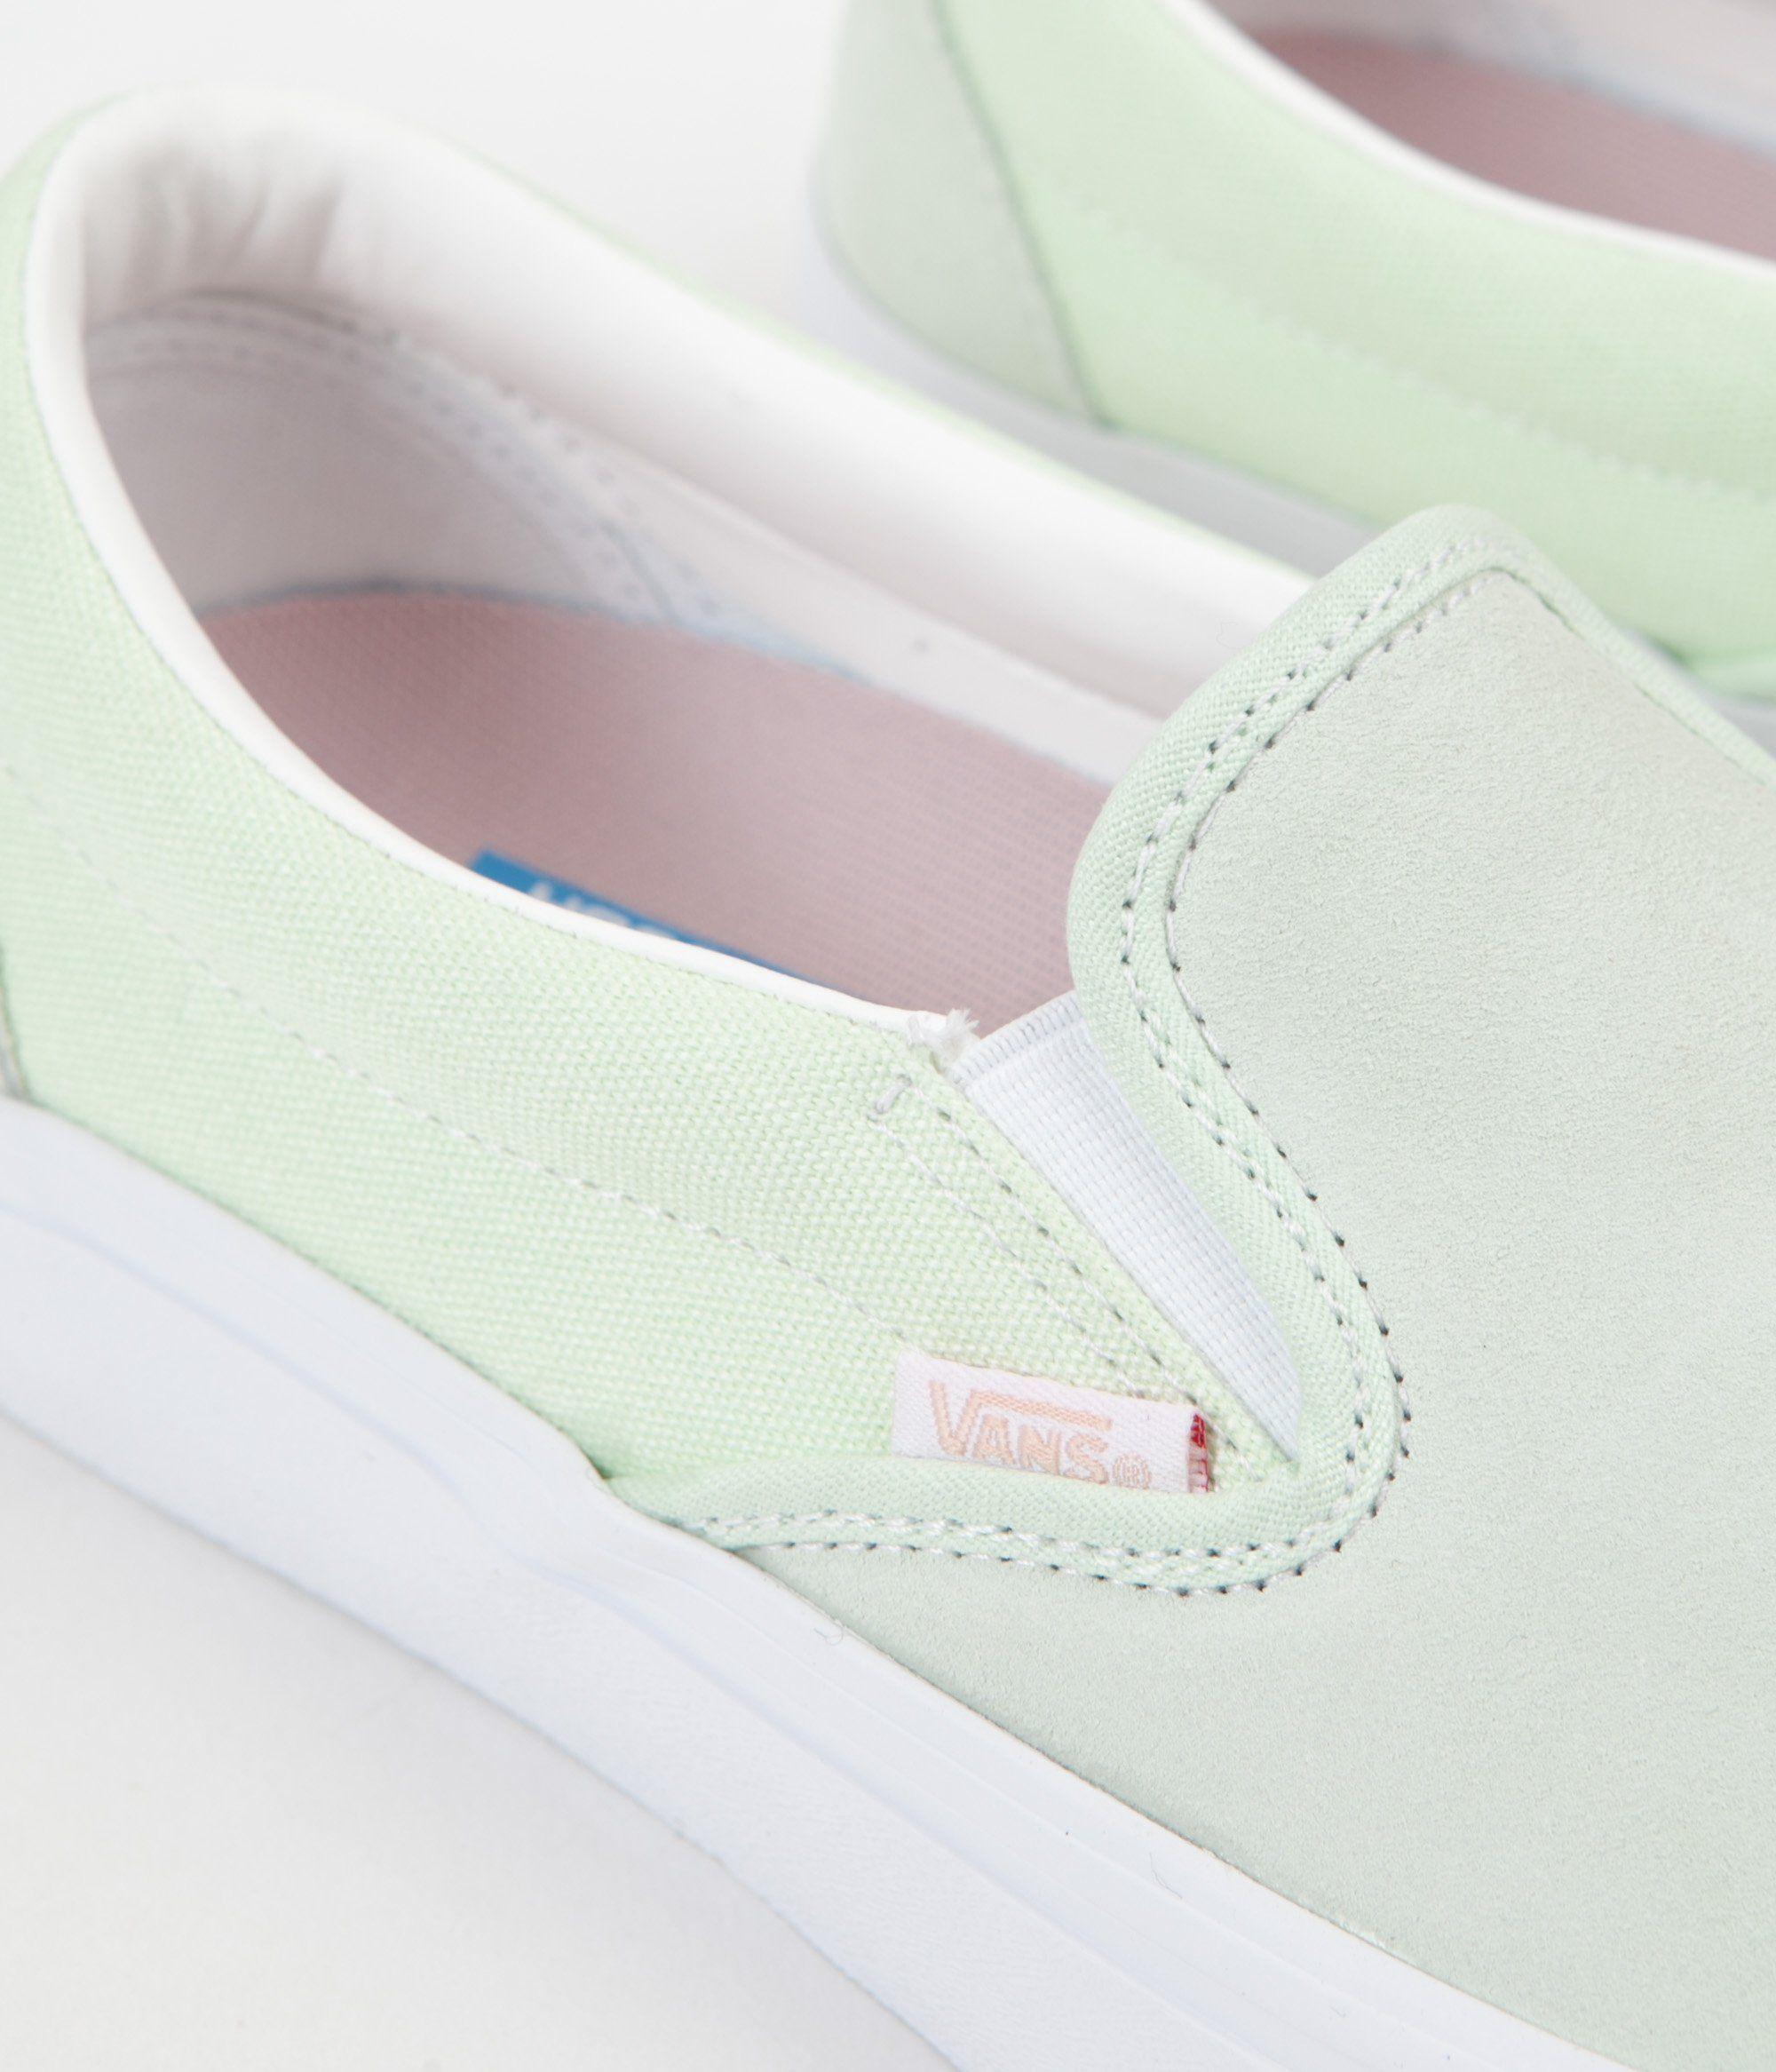 Vans Slip On Pro Shoes Ambrosia White Vans Slip On Pro Vans Slip On Vans